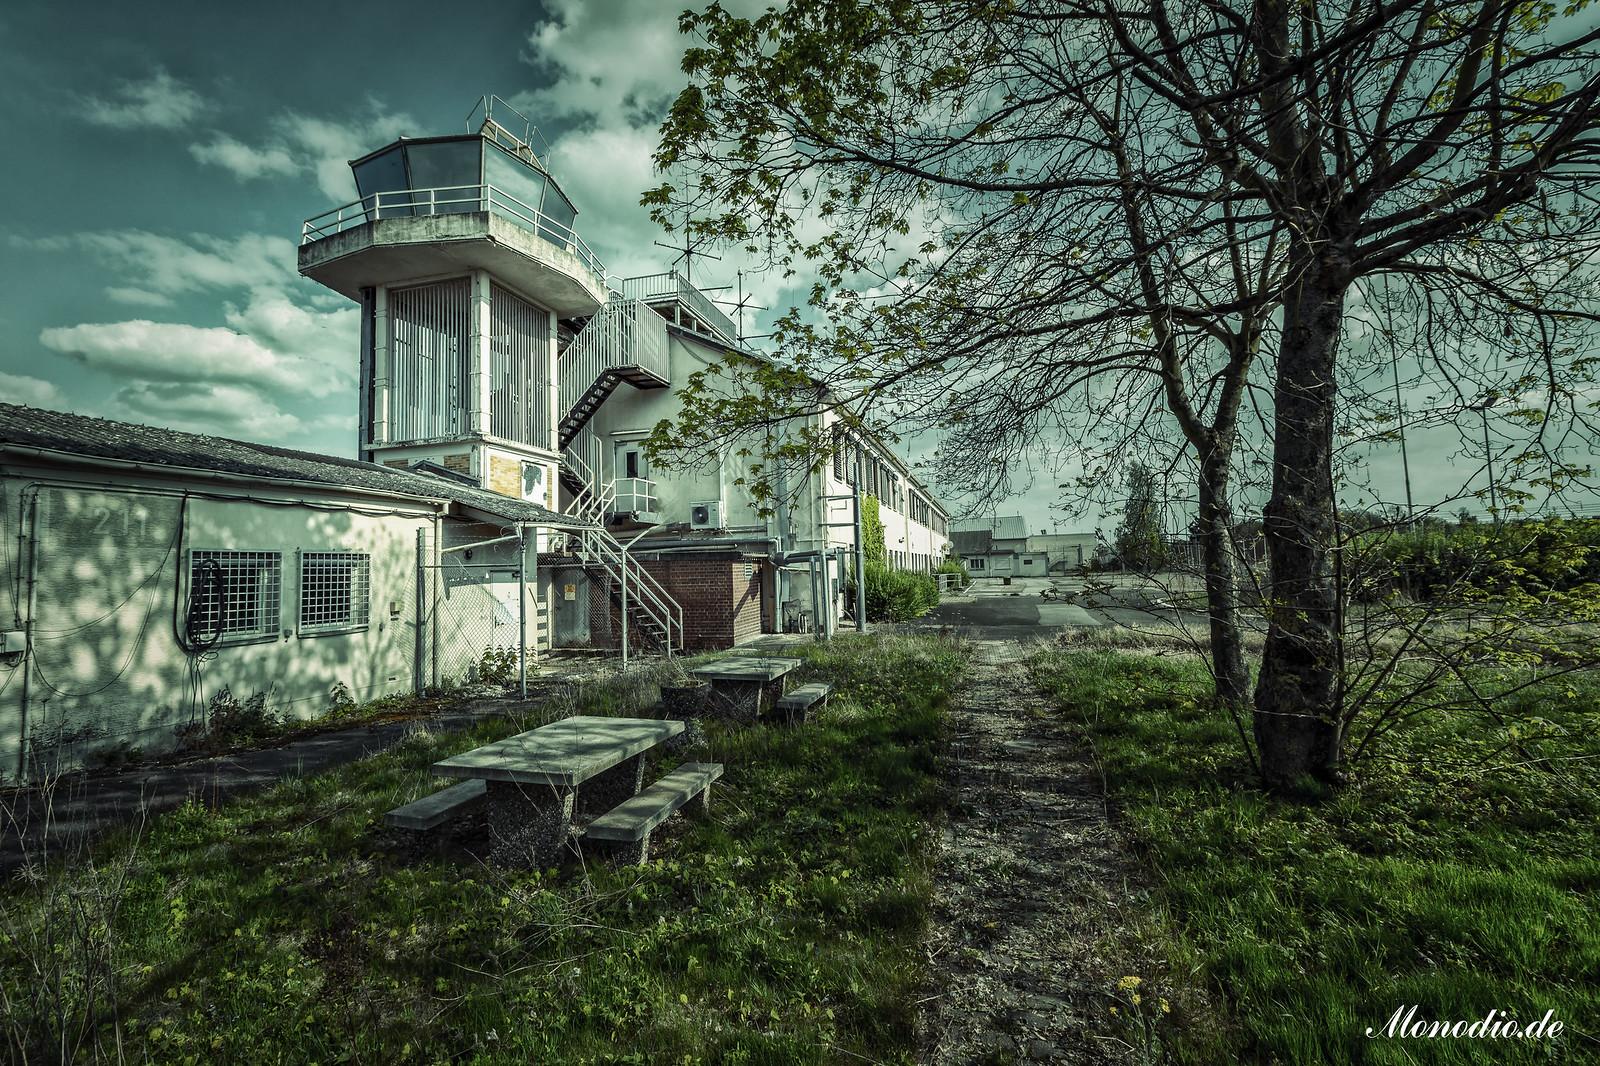 Lost U.S. Airbase